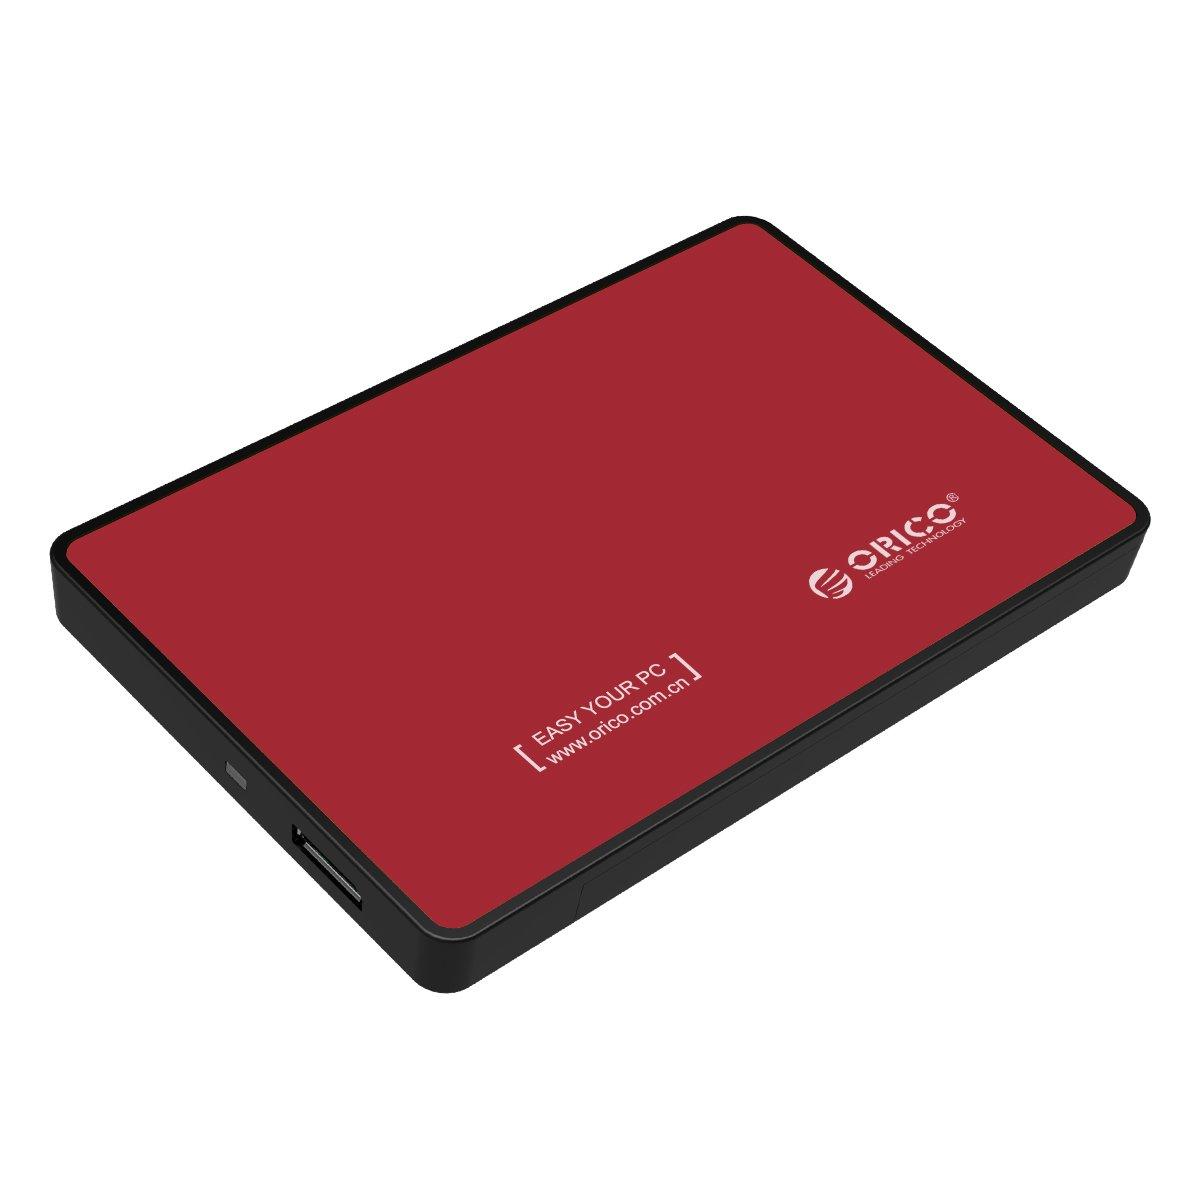 ORICO - 2.5 Pulgadas Caja Disco Duro Externo USB 2.0 a SATA - Libre de Herramientas para HDD/SSD de 9.5mm y 7mm - LED Indicador - Negro ORICO Technologies Co. Ltd